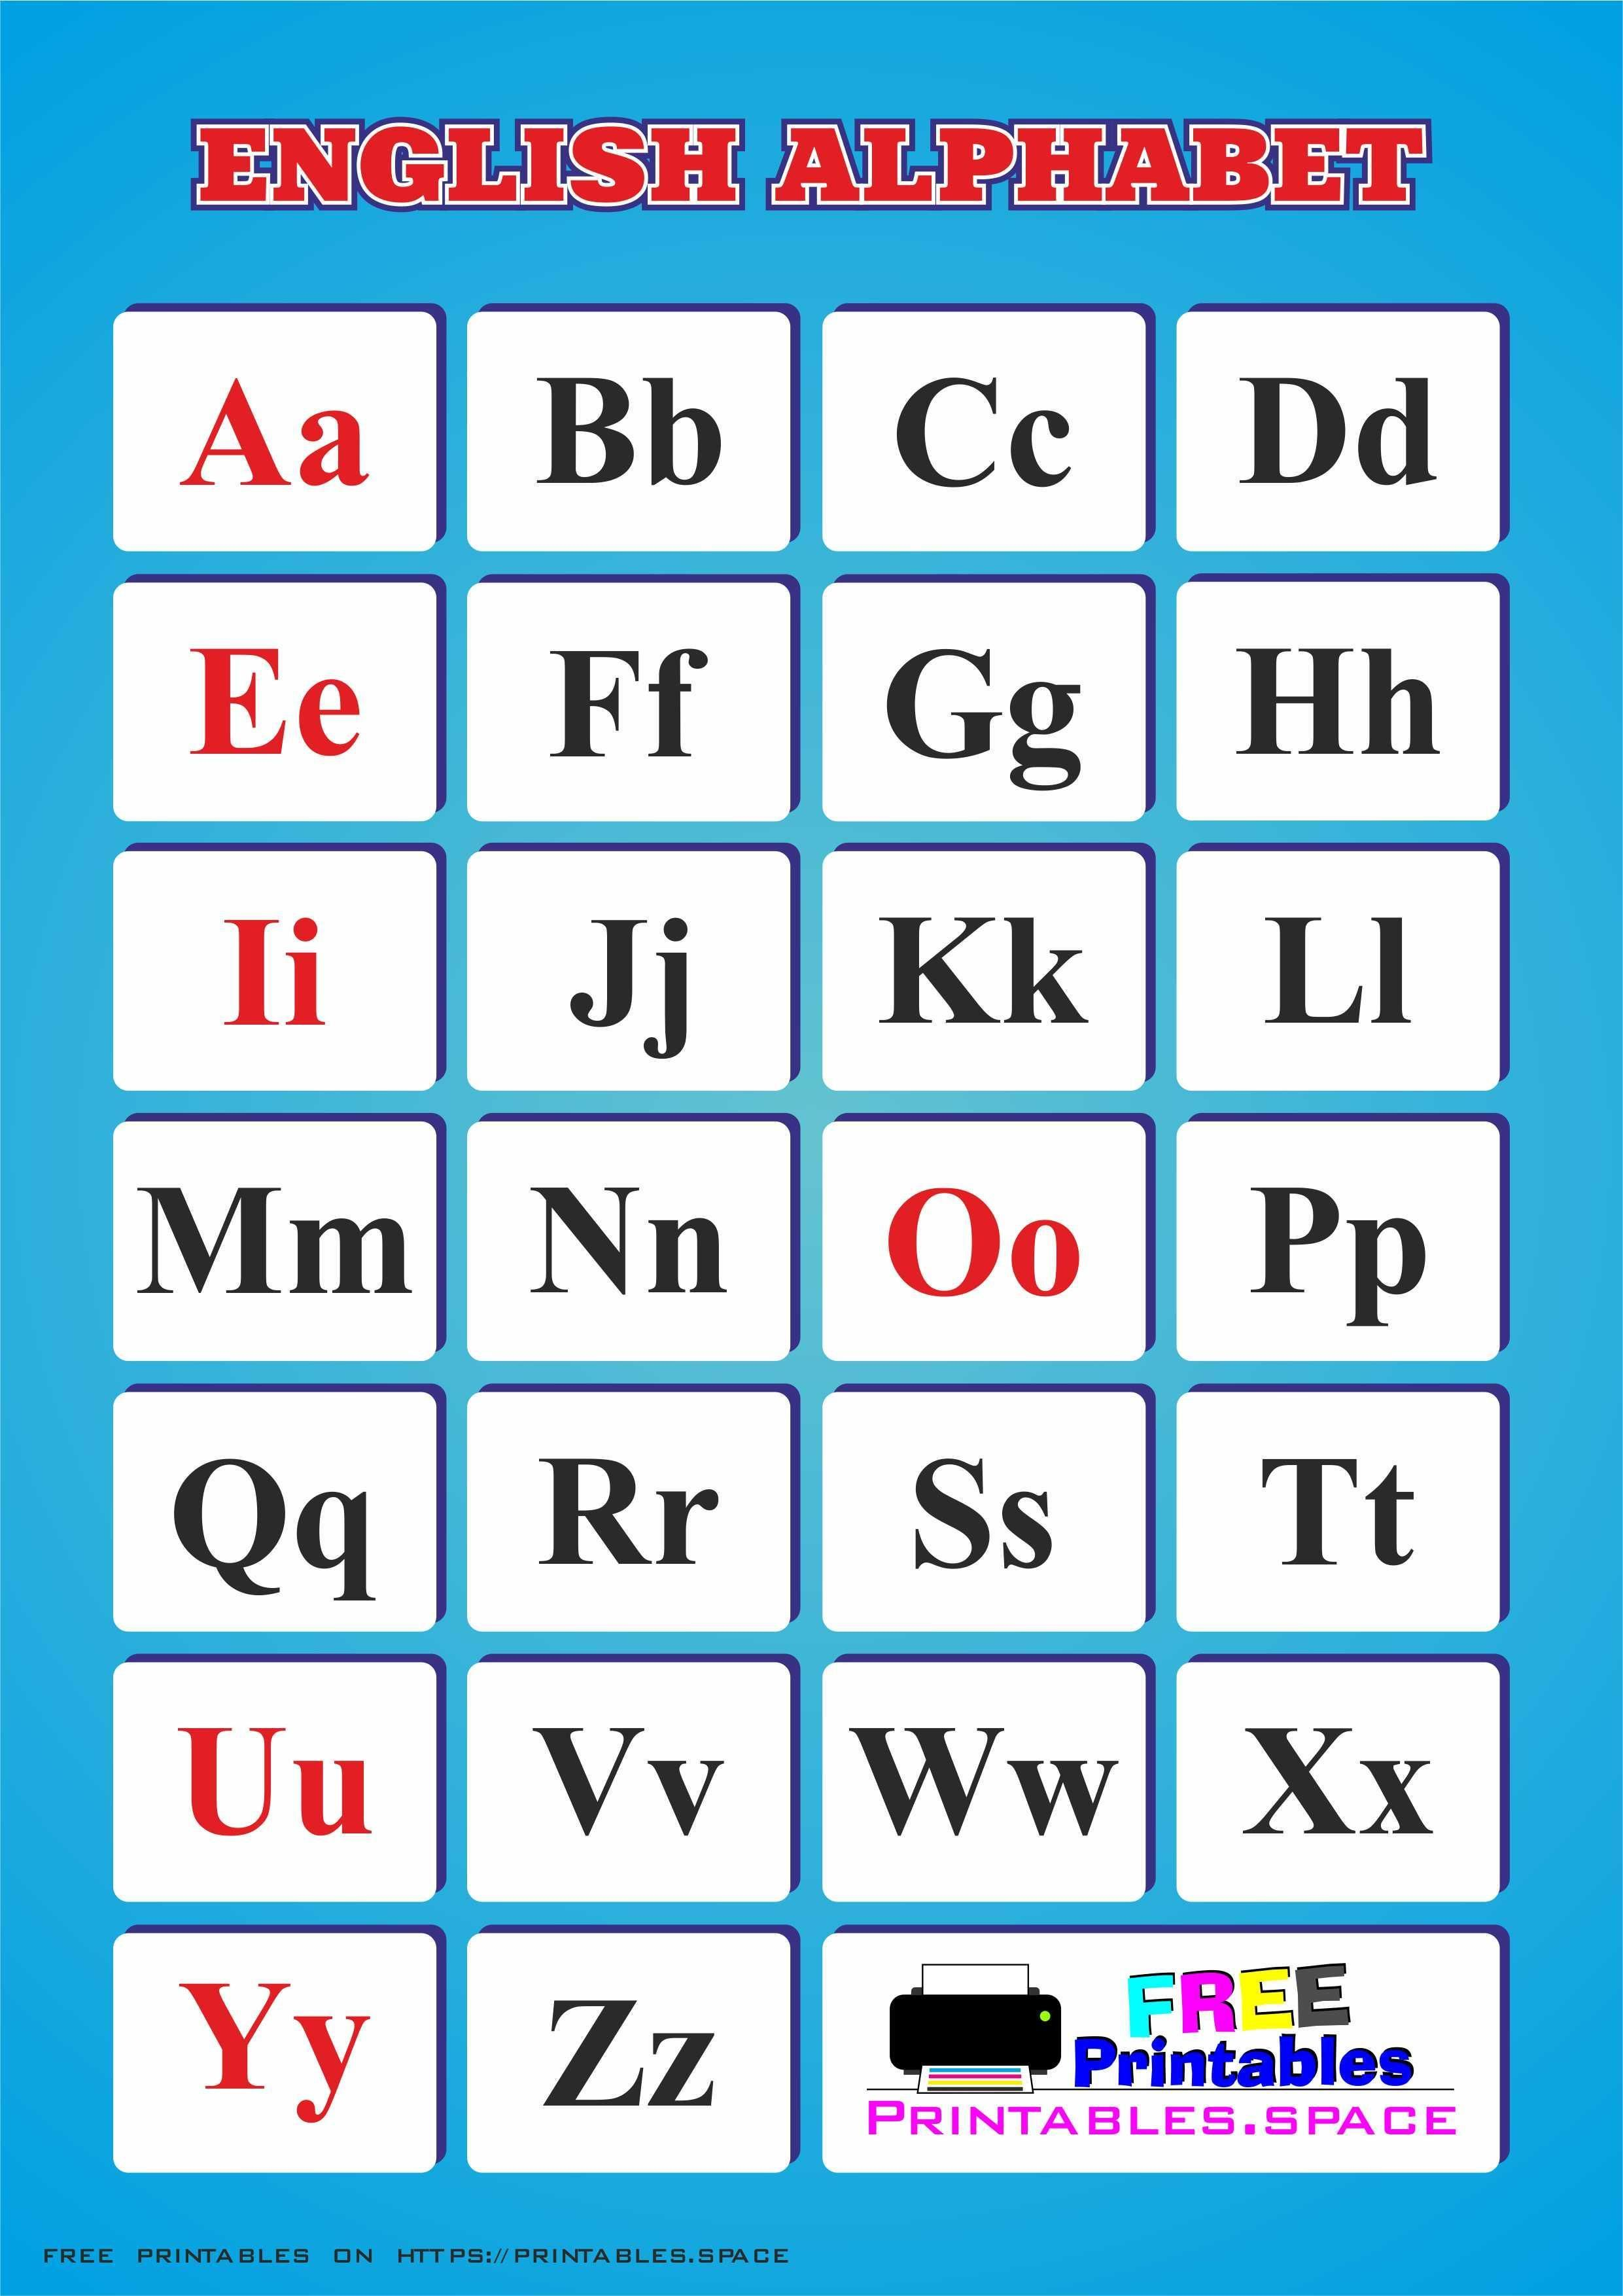 51 English Alphabet Printable English Alphabet English Alphabet Letters Alphabet [ 3509 x 2481 Pixel ]